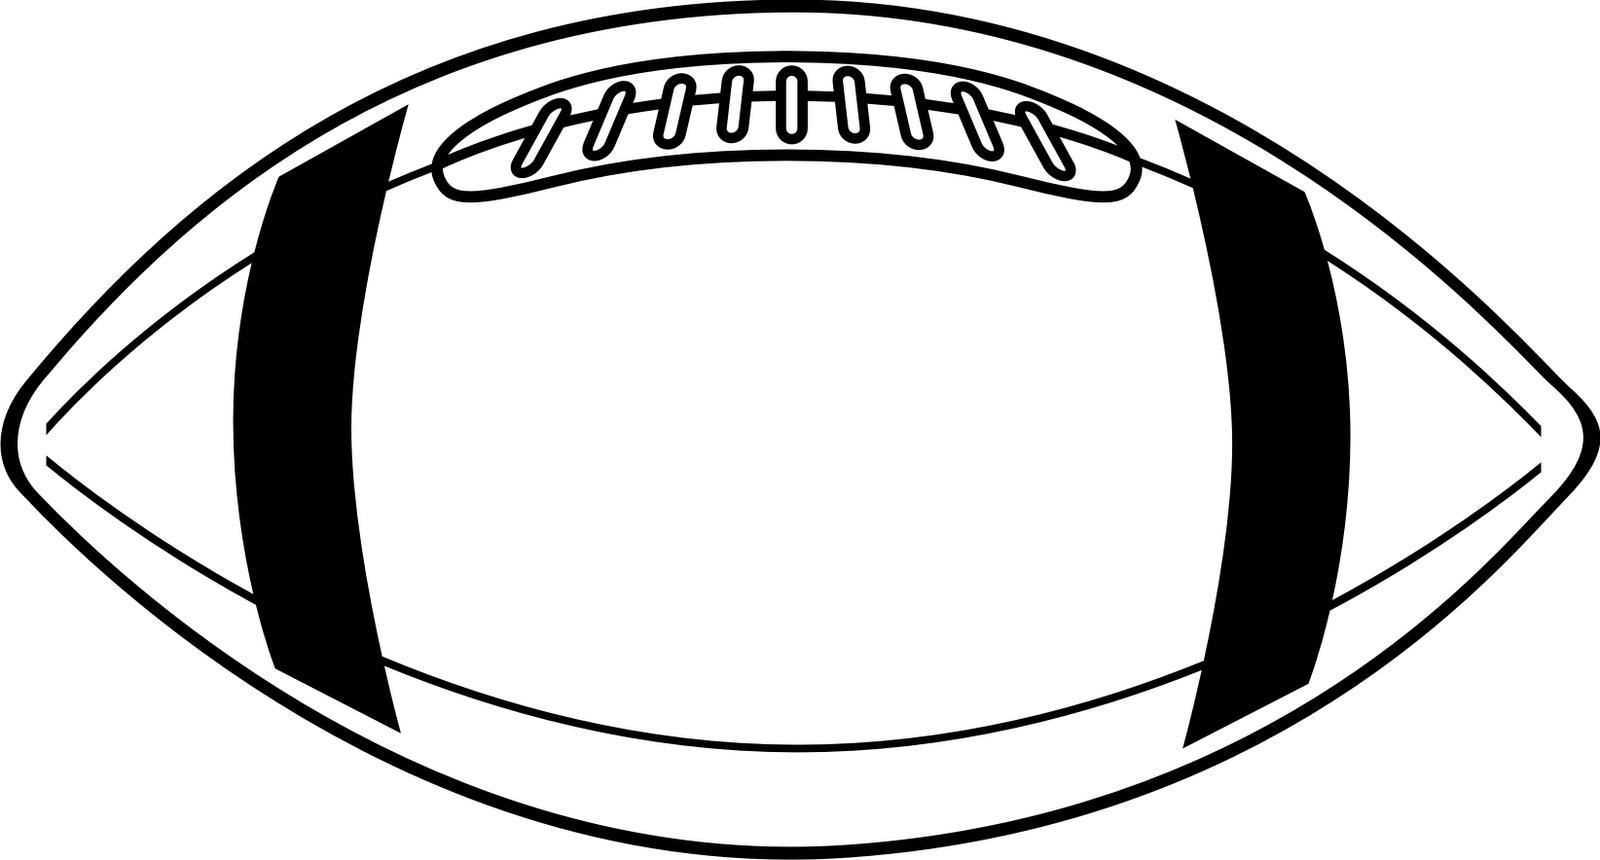 ... Football clipart black ou - Football Clip Art